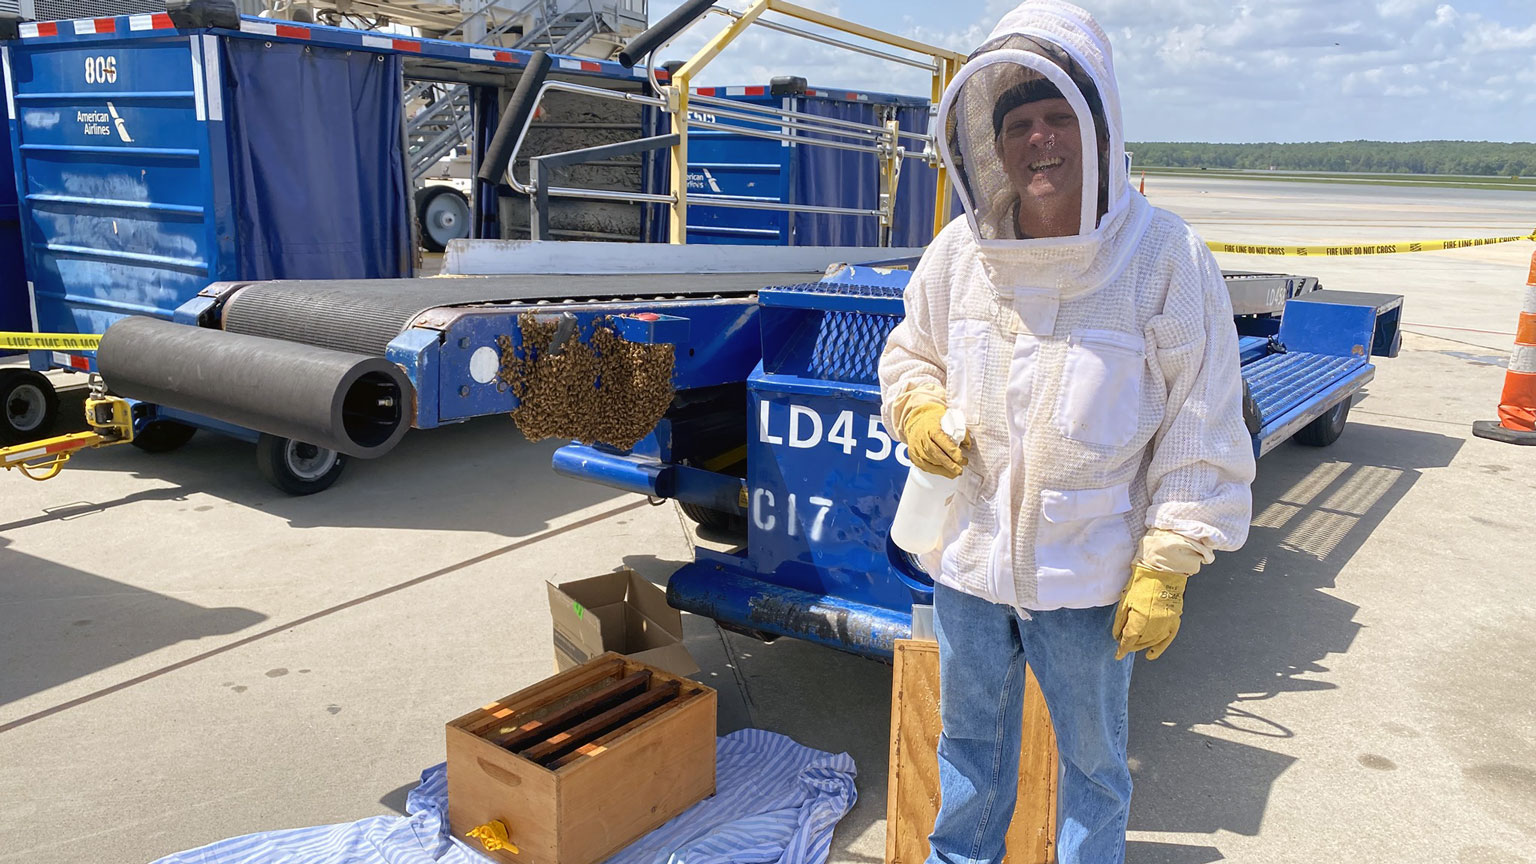 Man in protective gear near bee swarm